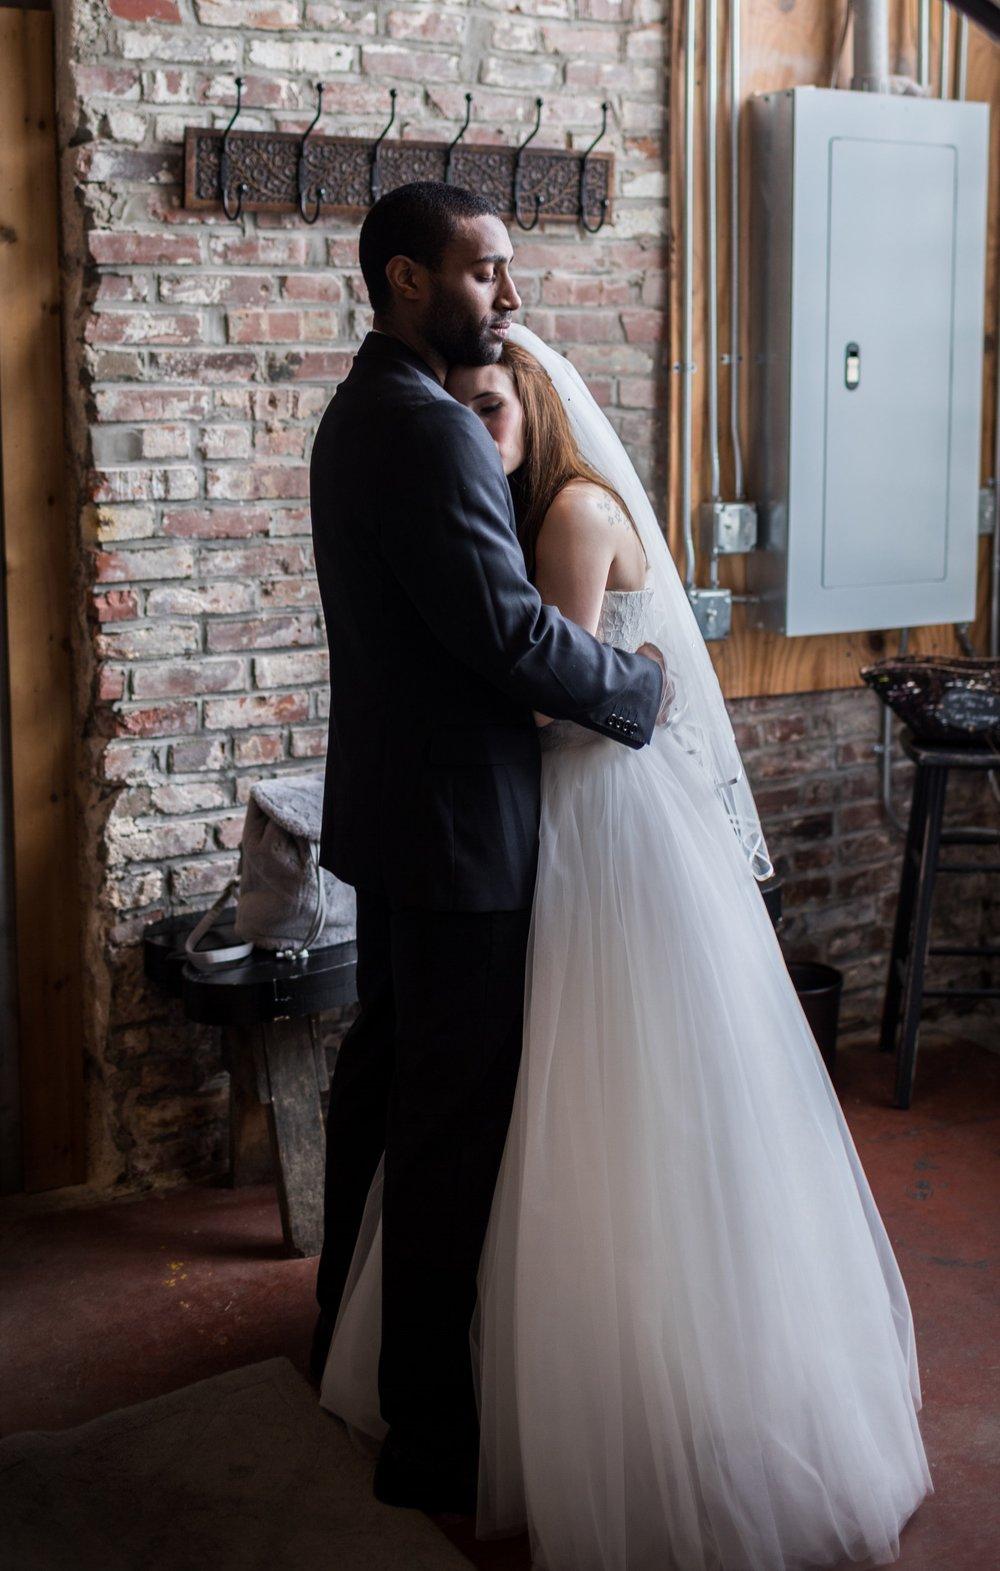 Kansas_City_Small_Wedding_Venue_Elope_Intimate_Ceremony_Budget_Affordable_15MinWedding-105.jpg